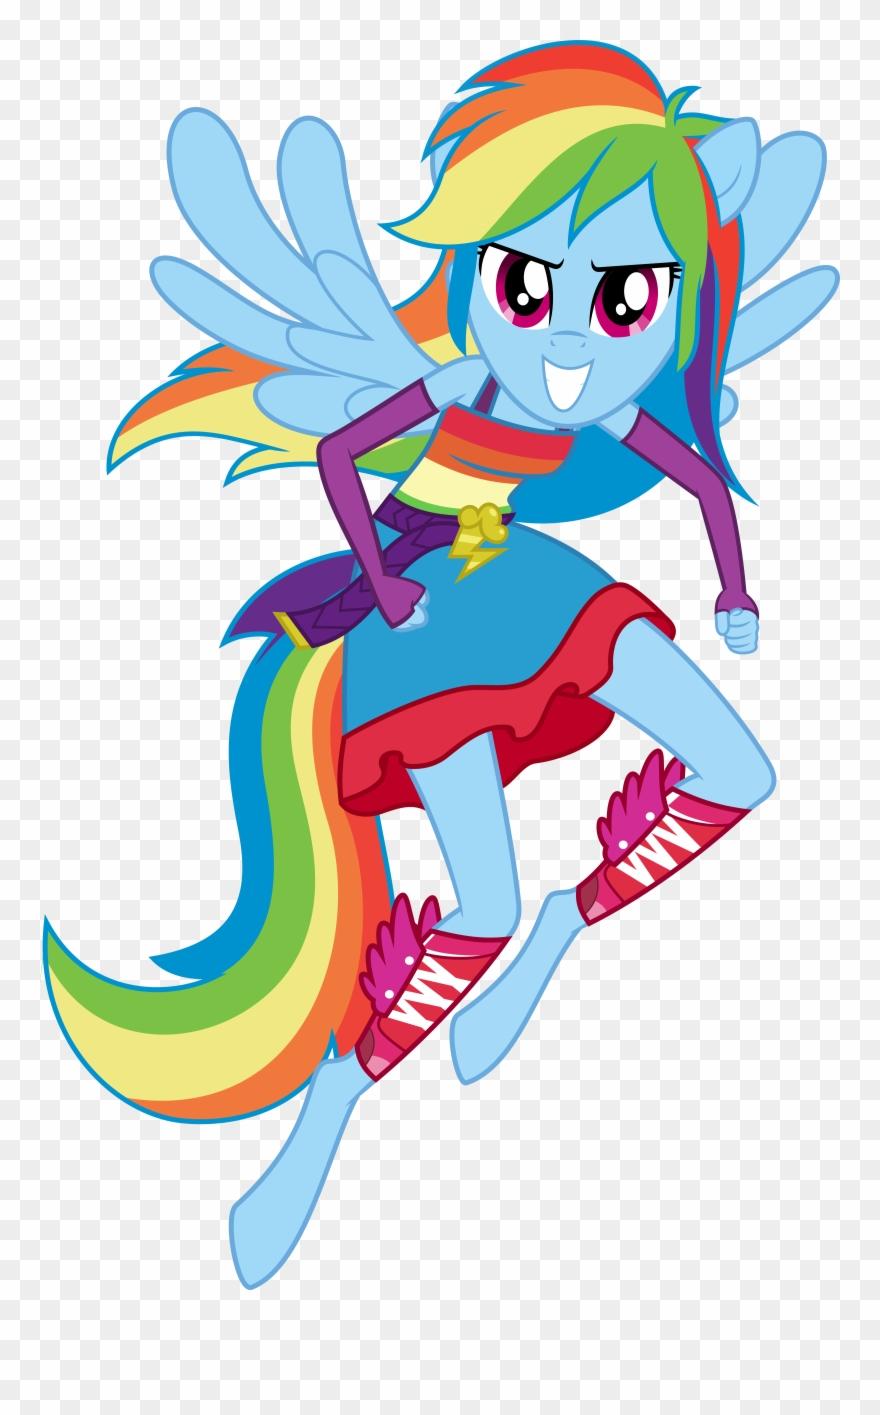 - Rainbow Dash Full Anthro Clip Art Stock - My Little Pony Equestria